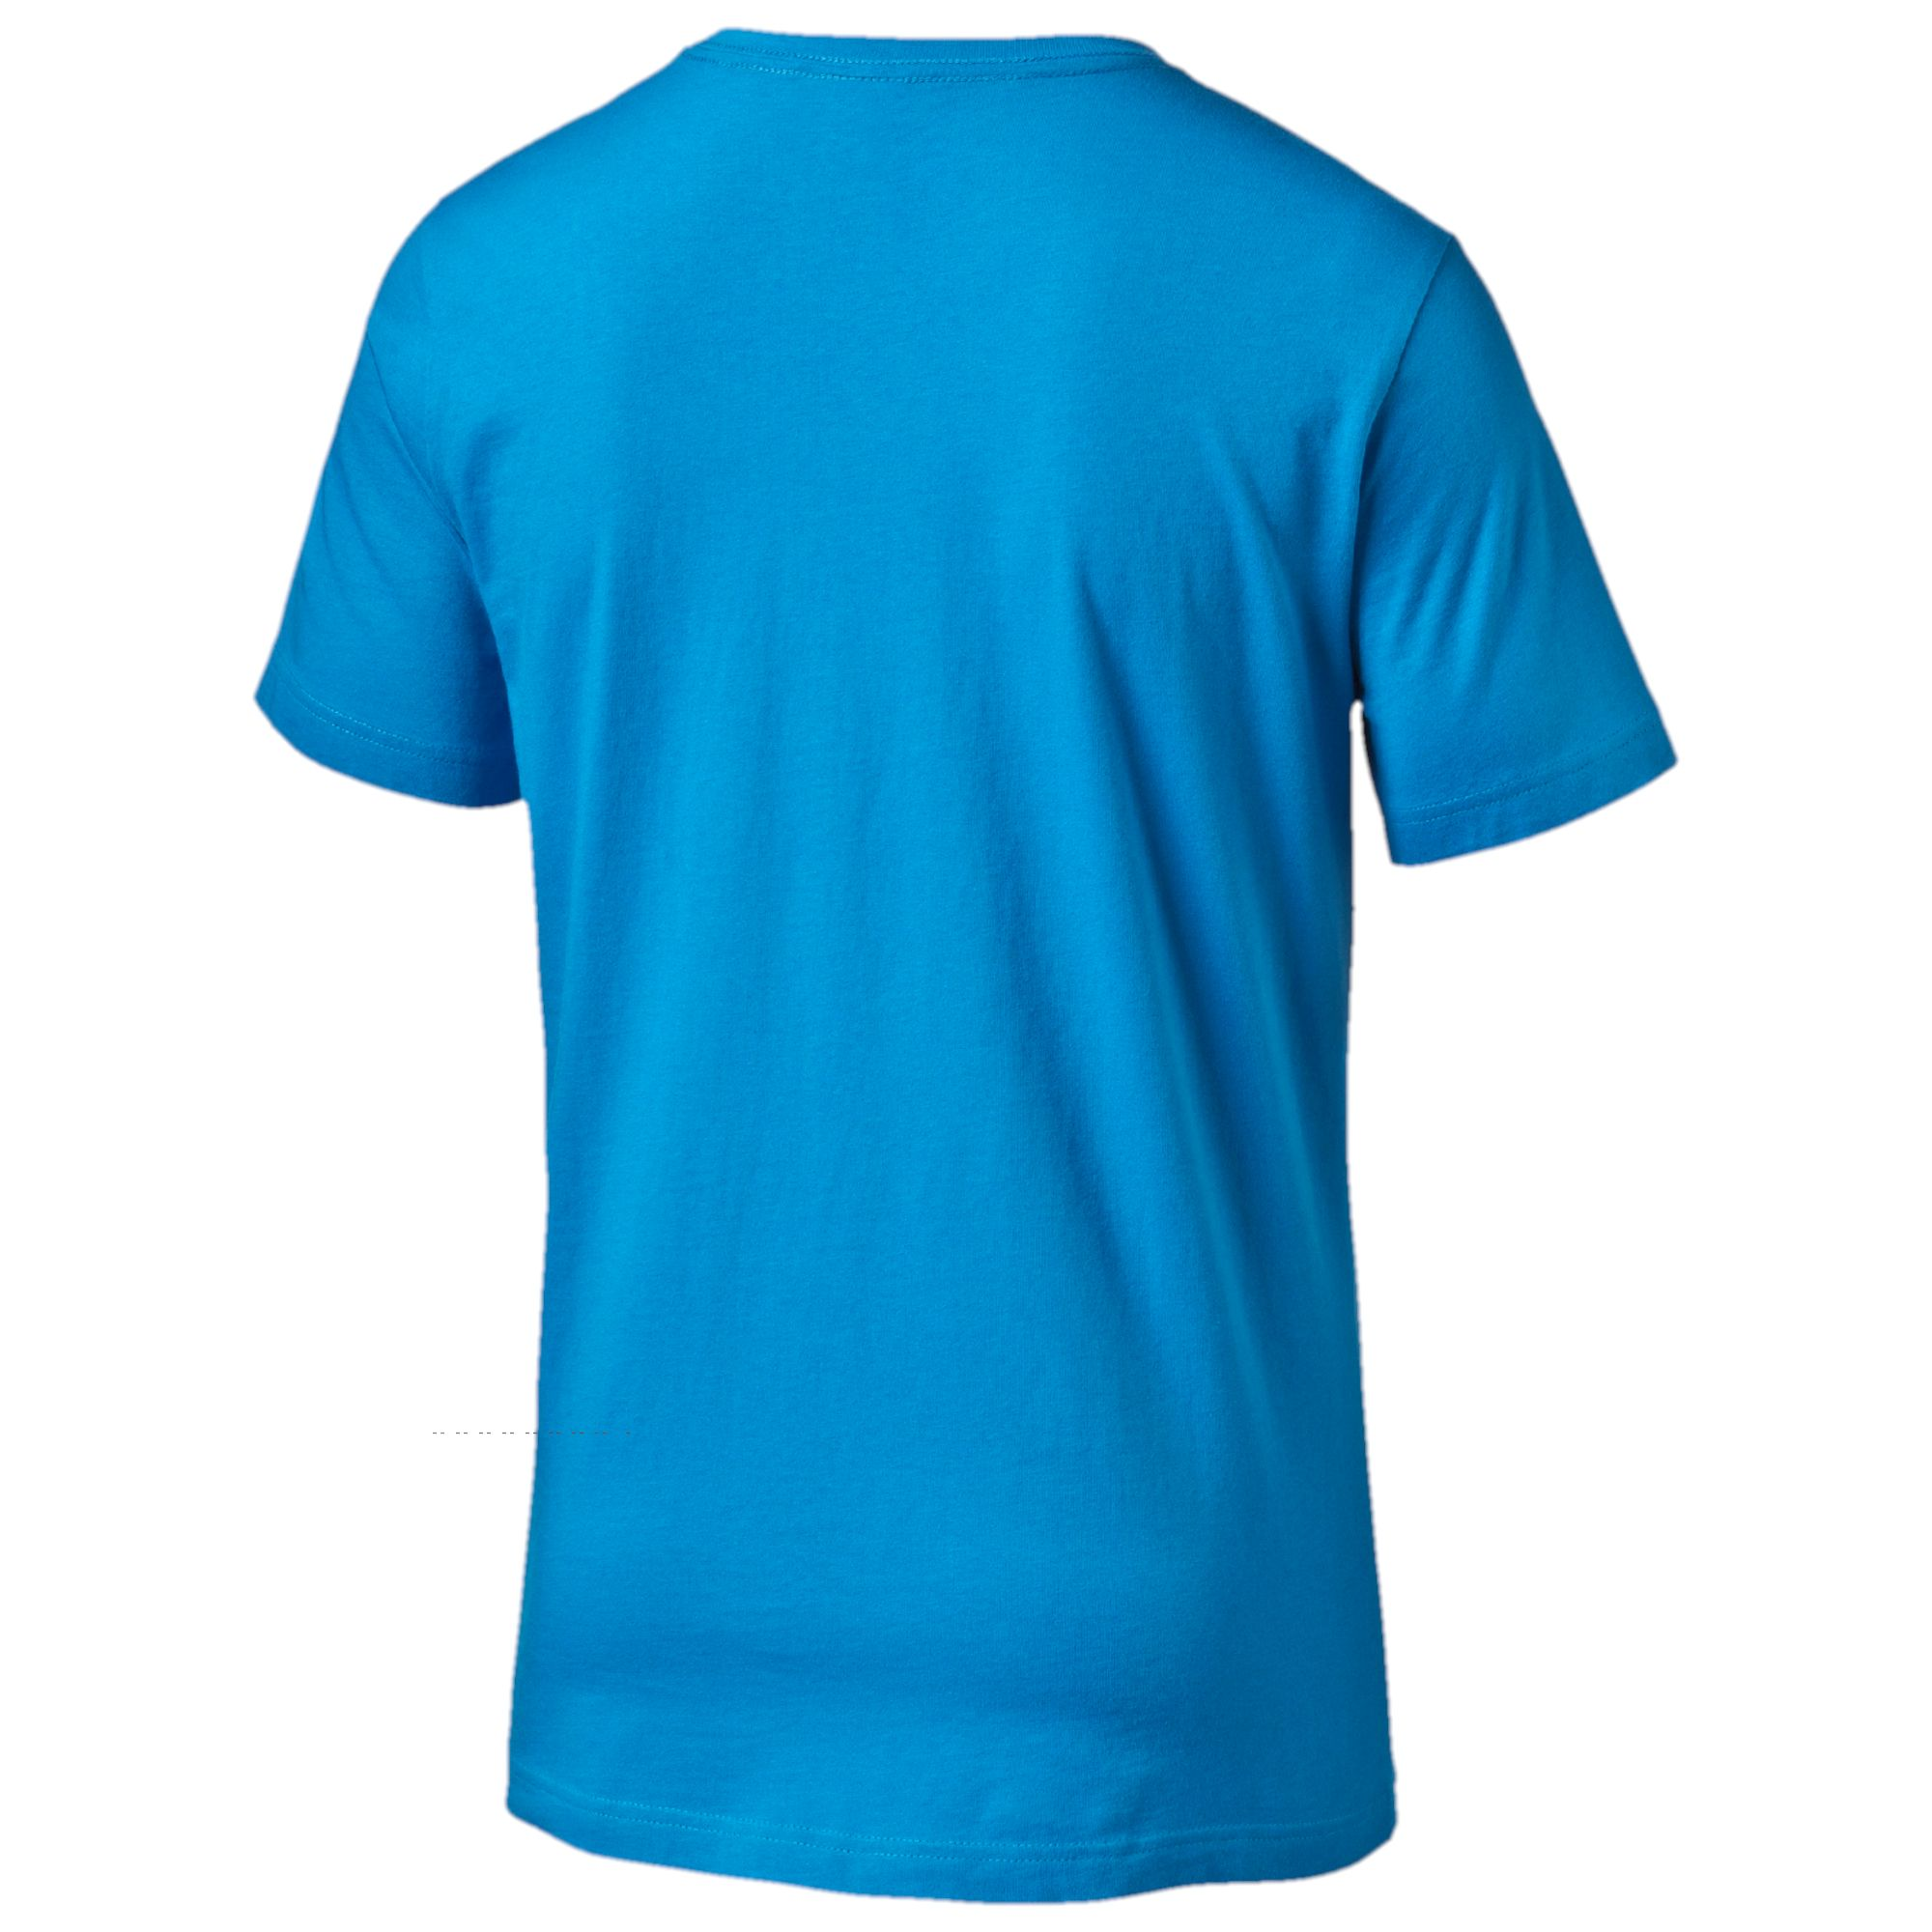 puma no 1 logo t shirt bekleidung t shirts shirt basics herren neu. Black Bedroom Furniture Sets. Home Design Ideas